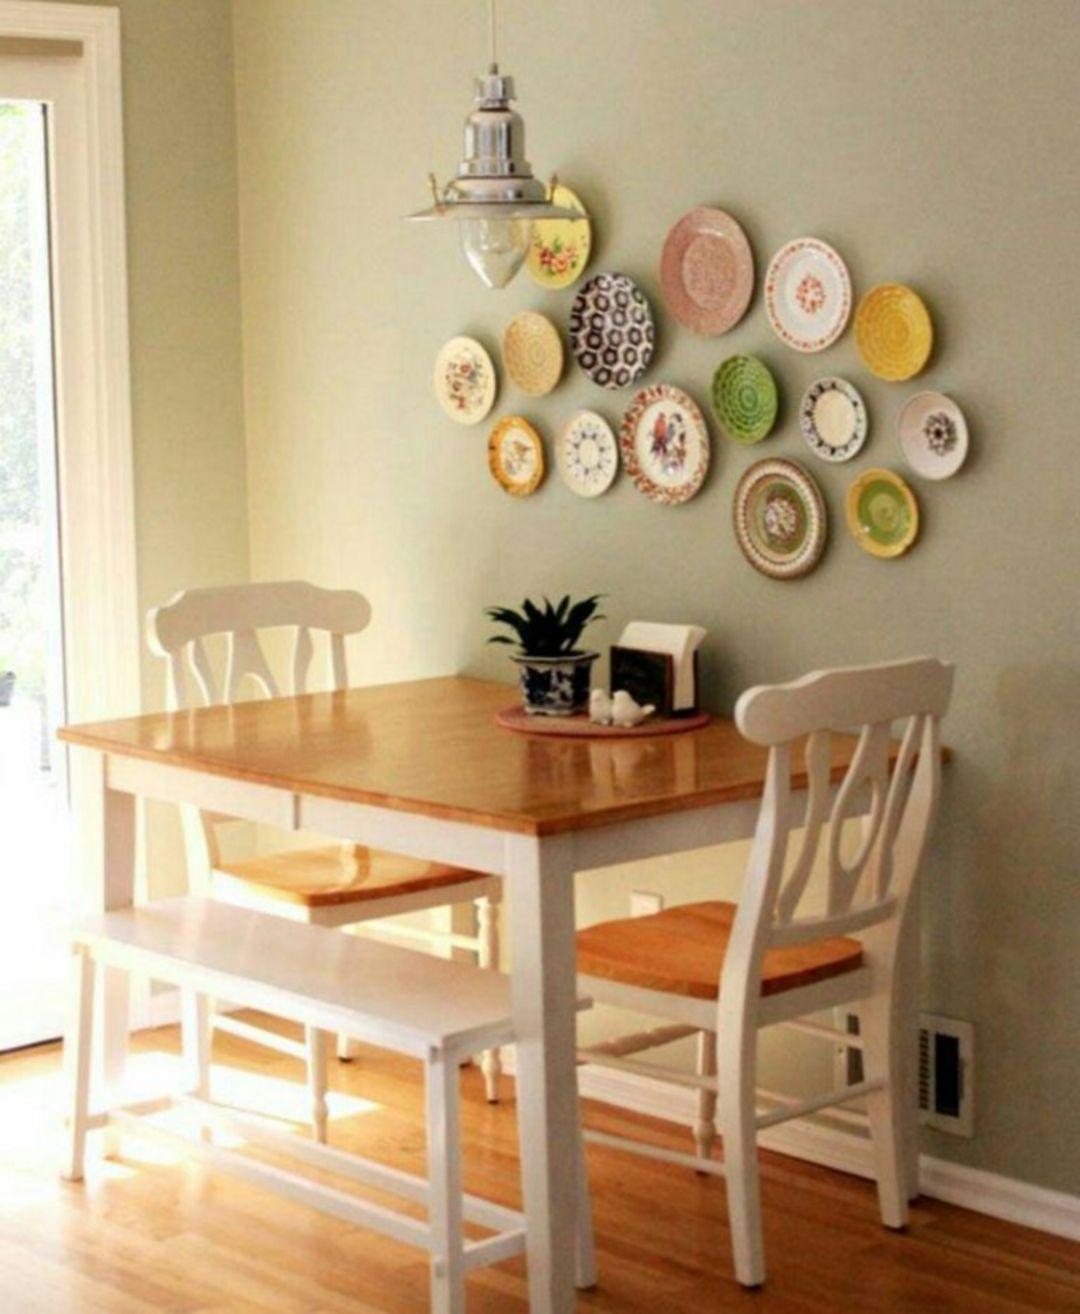 10 Unique Small Kitchen Design Ideas: 10+ Fabulous Tiny Dining Room Design Ideas For Romantic